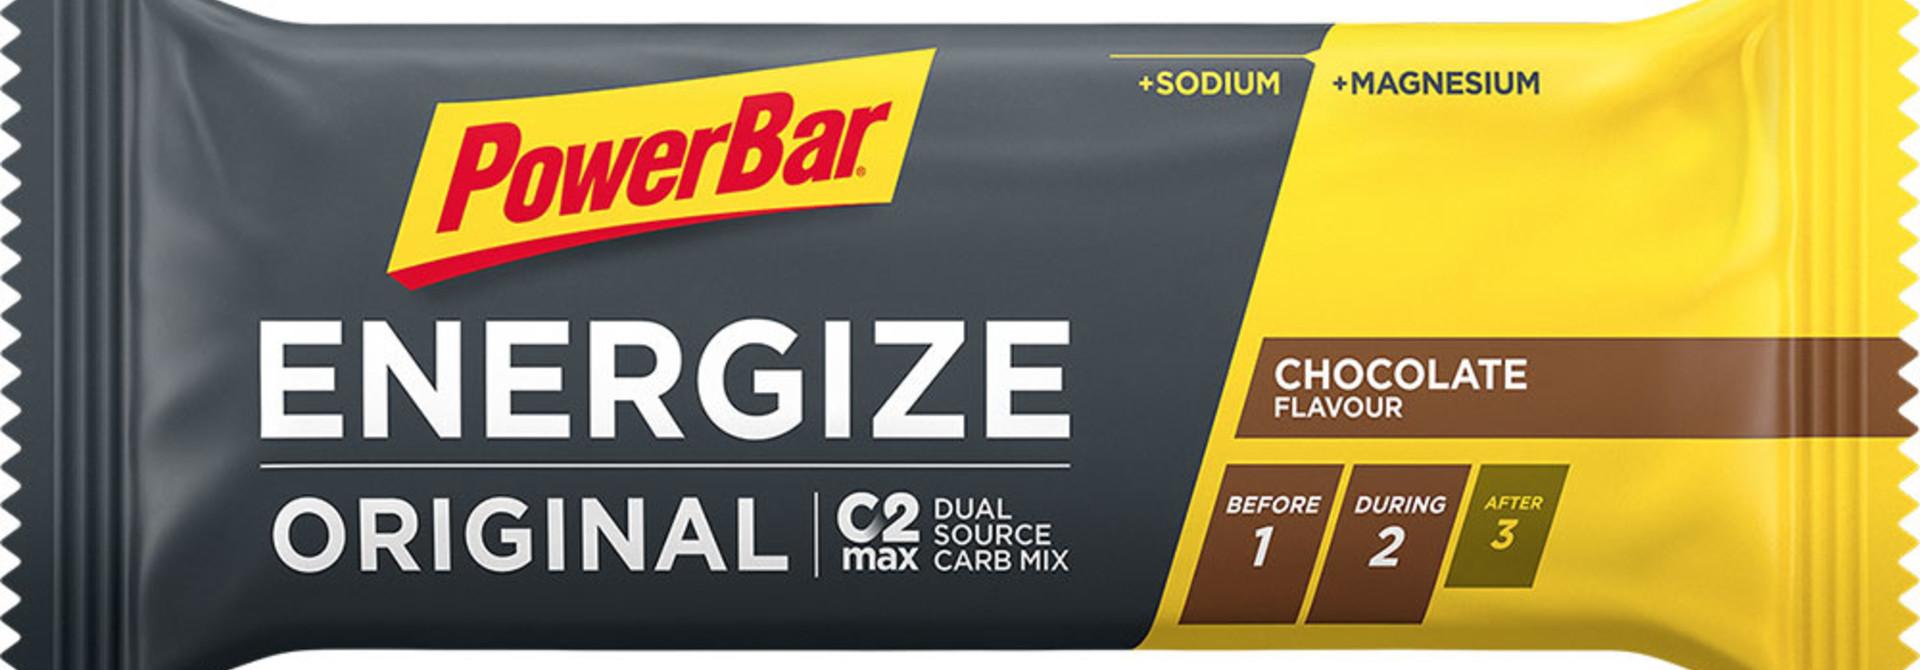 PowerBar Energize Original - Chocolate